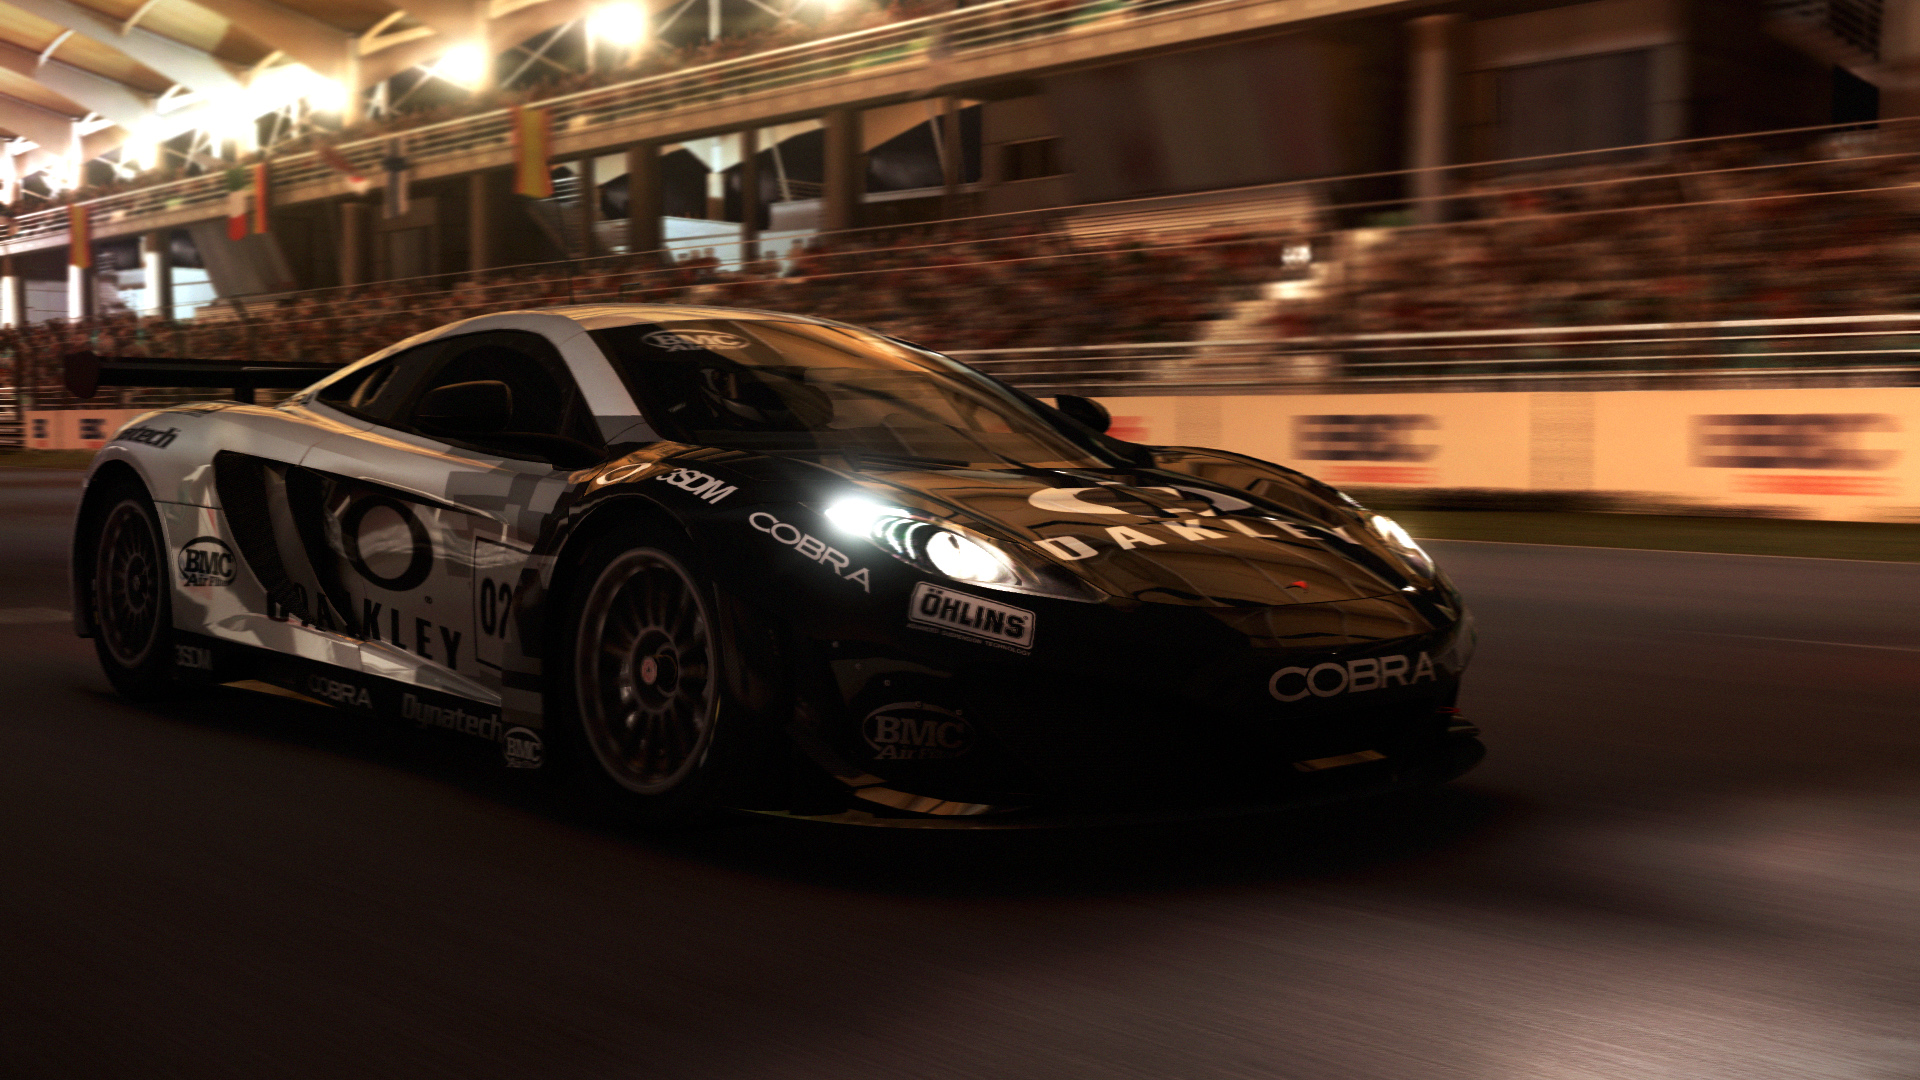 GRID Autosport Complete Setup Free Download